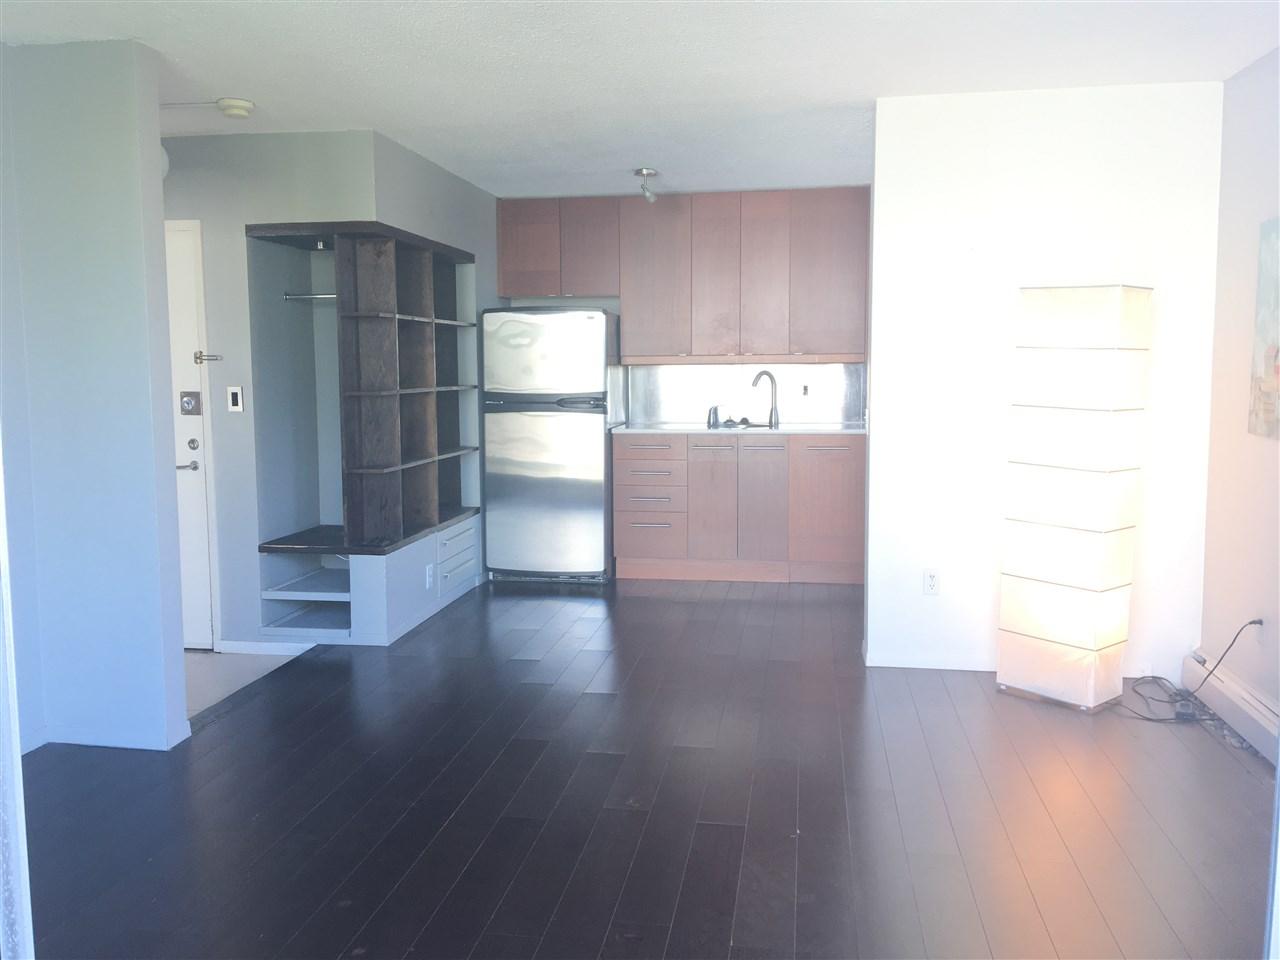 Condo Apartment at 702 1534 HARWOOD STREET, Unit 702, Vancouver West, British Columbia. Image 2